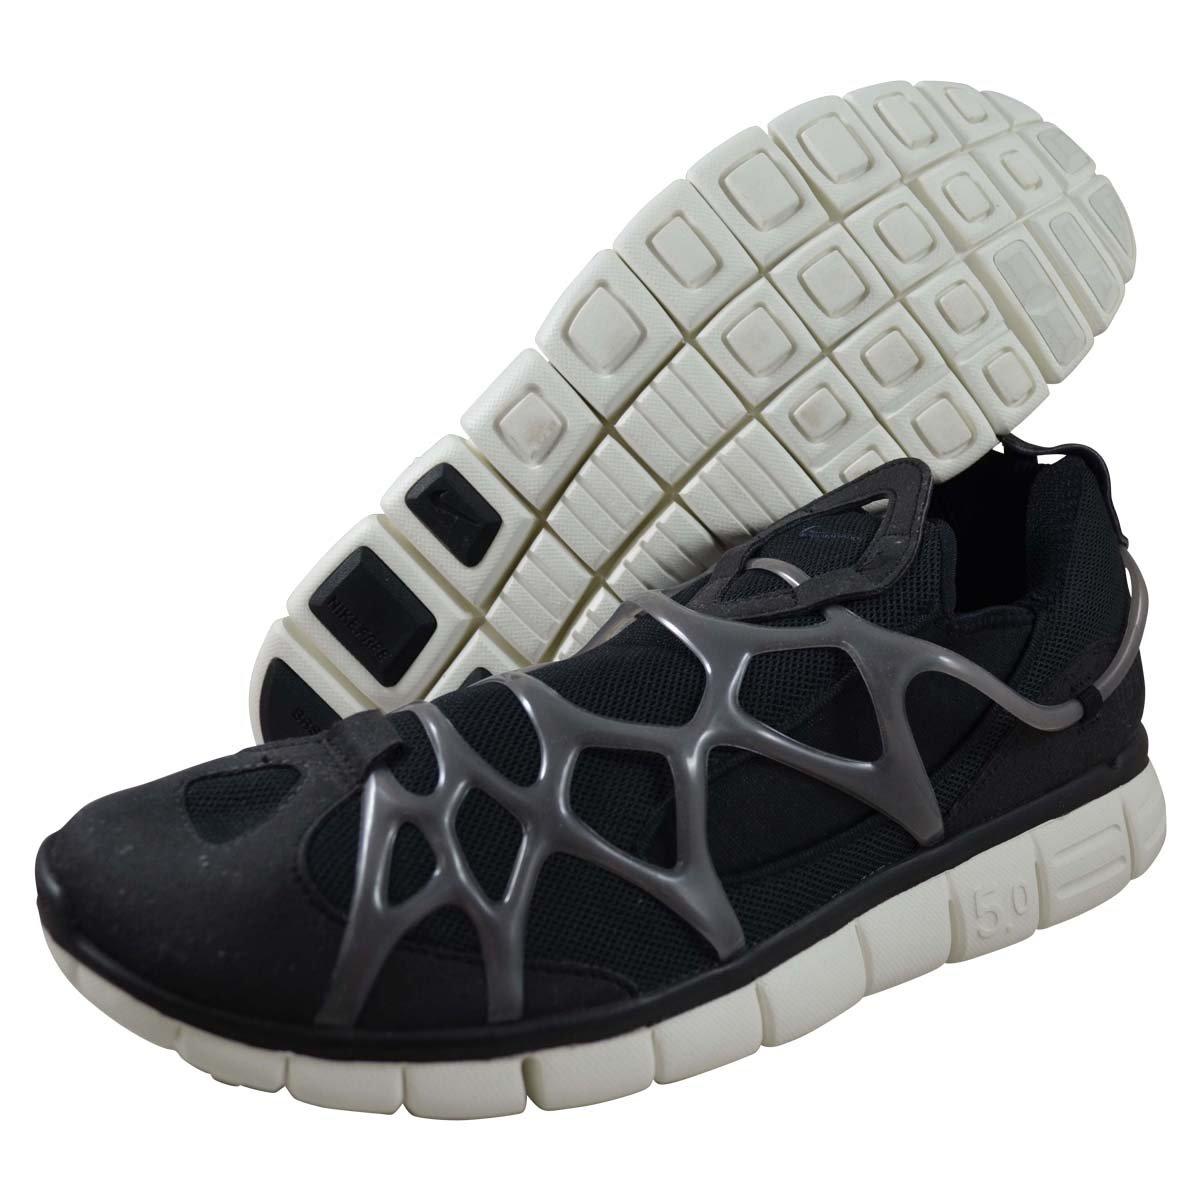 Nike Kukini Free Laufschuhe black anthracite sail 47,5